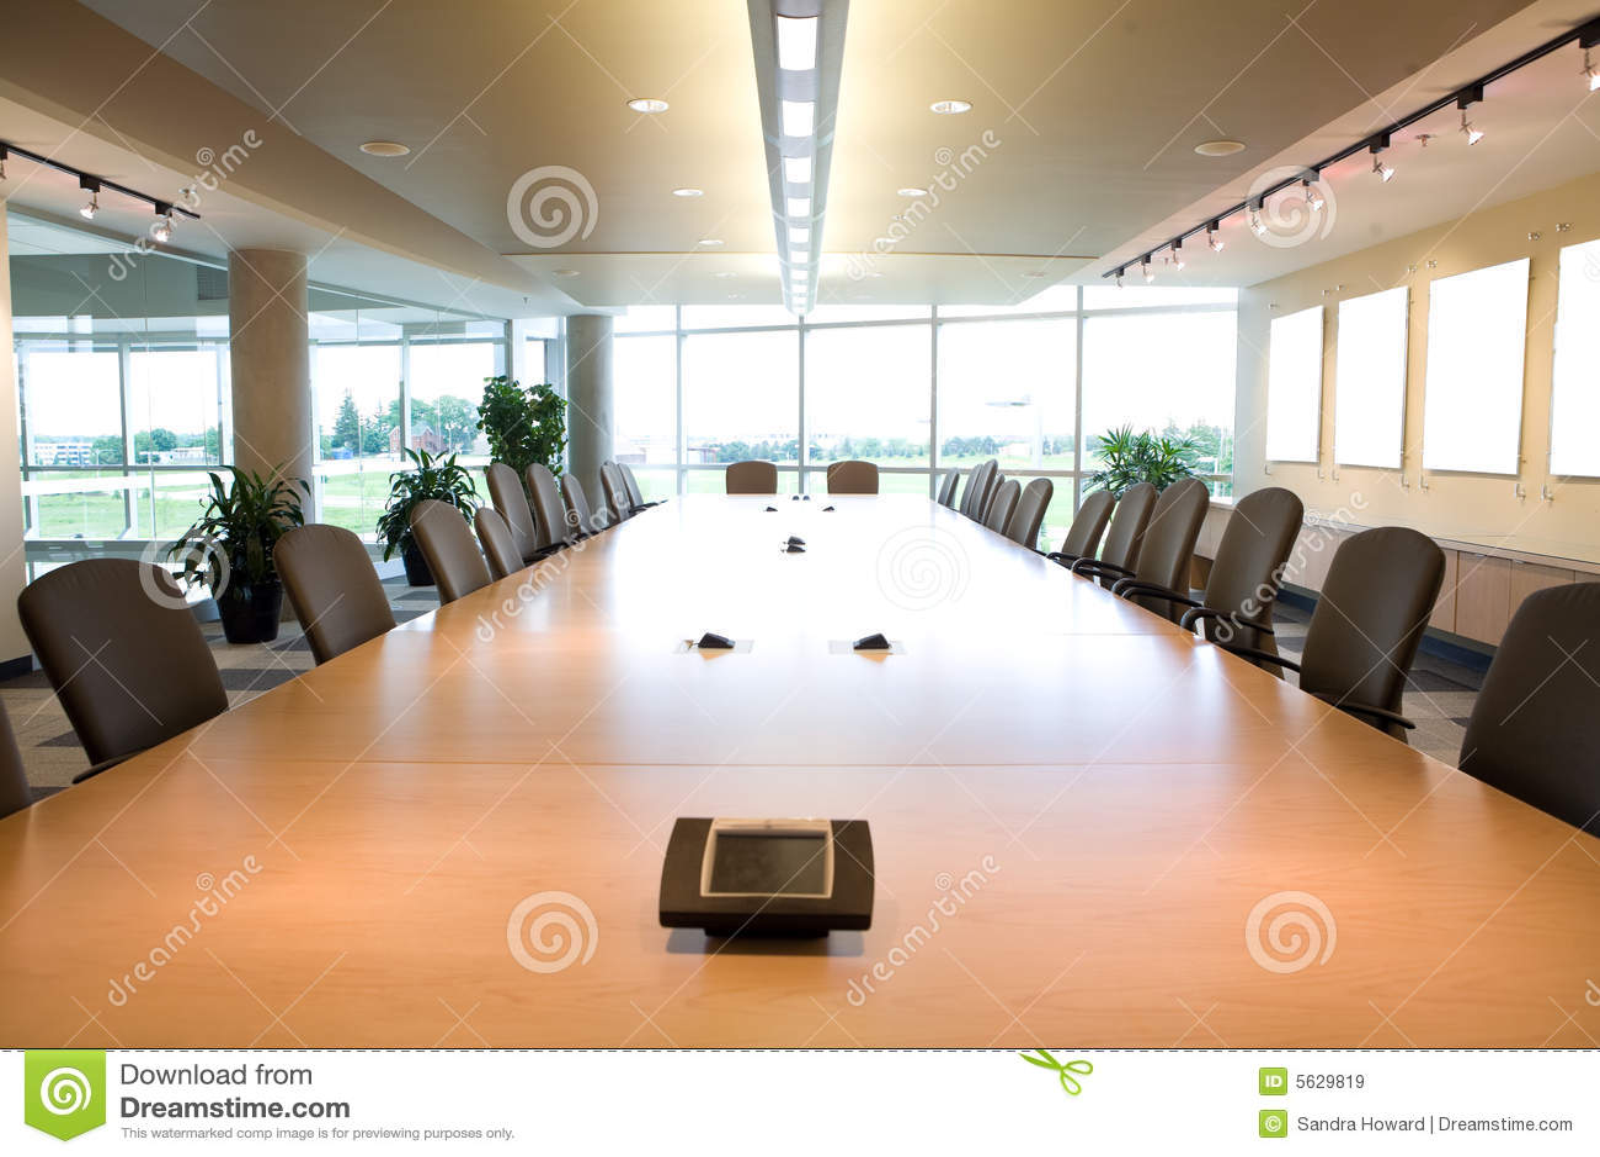 Executivsitzungssaalkopfansicht In Sauberes Büro Stockbild Bild